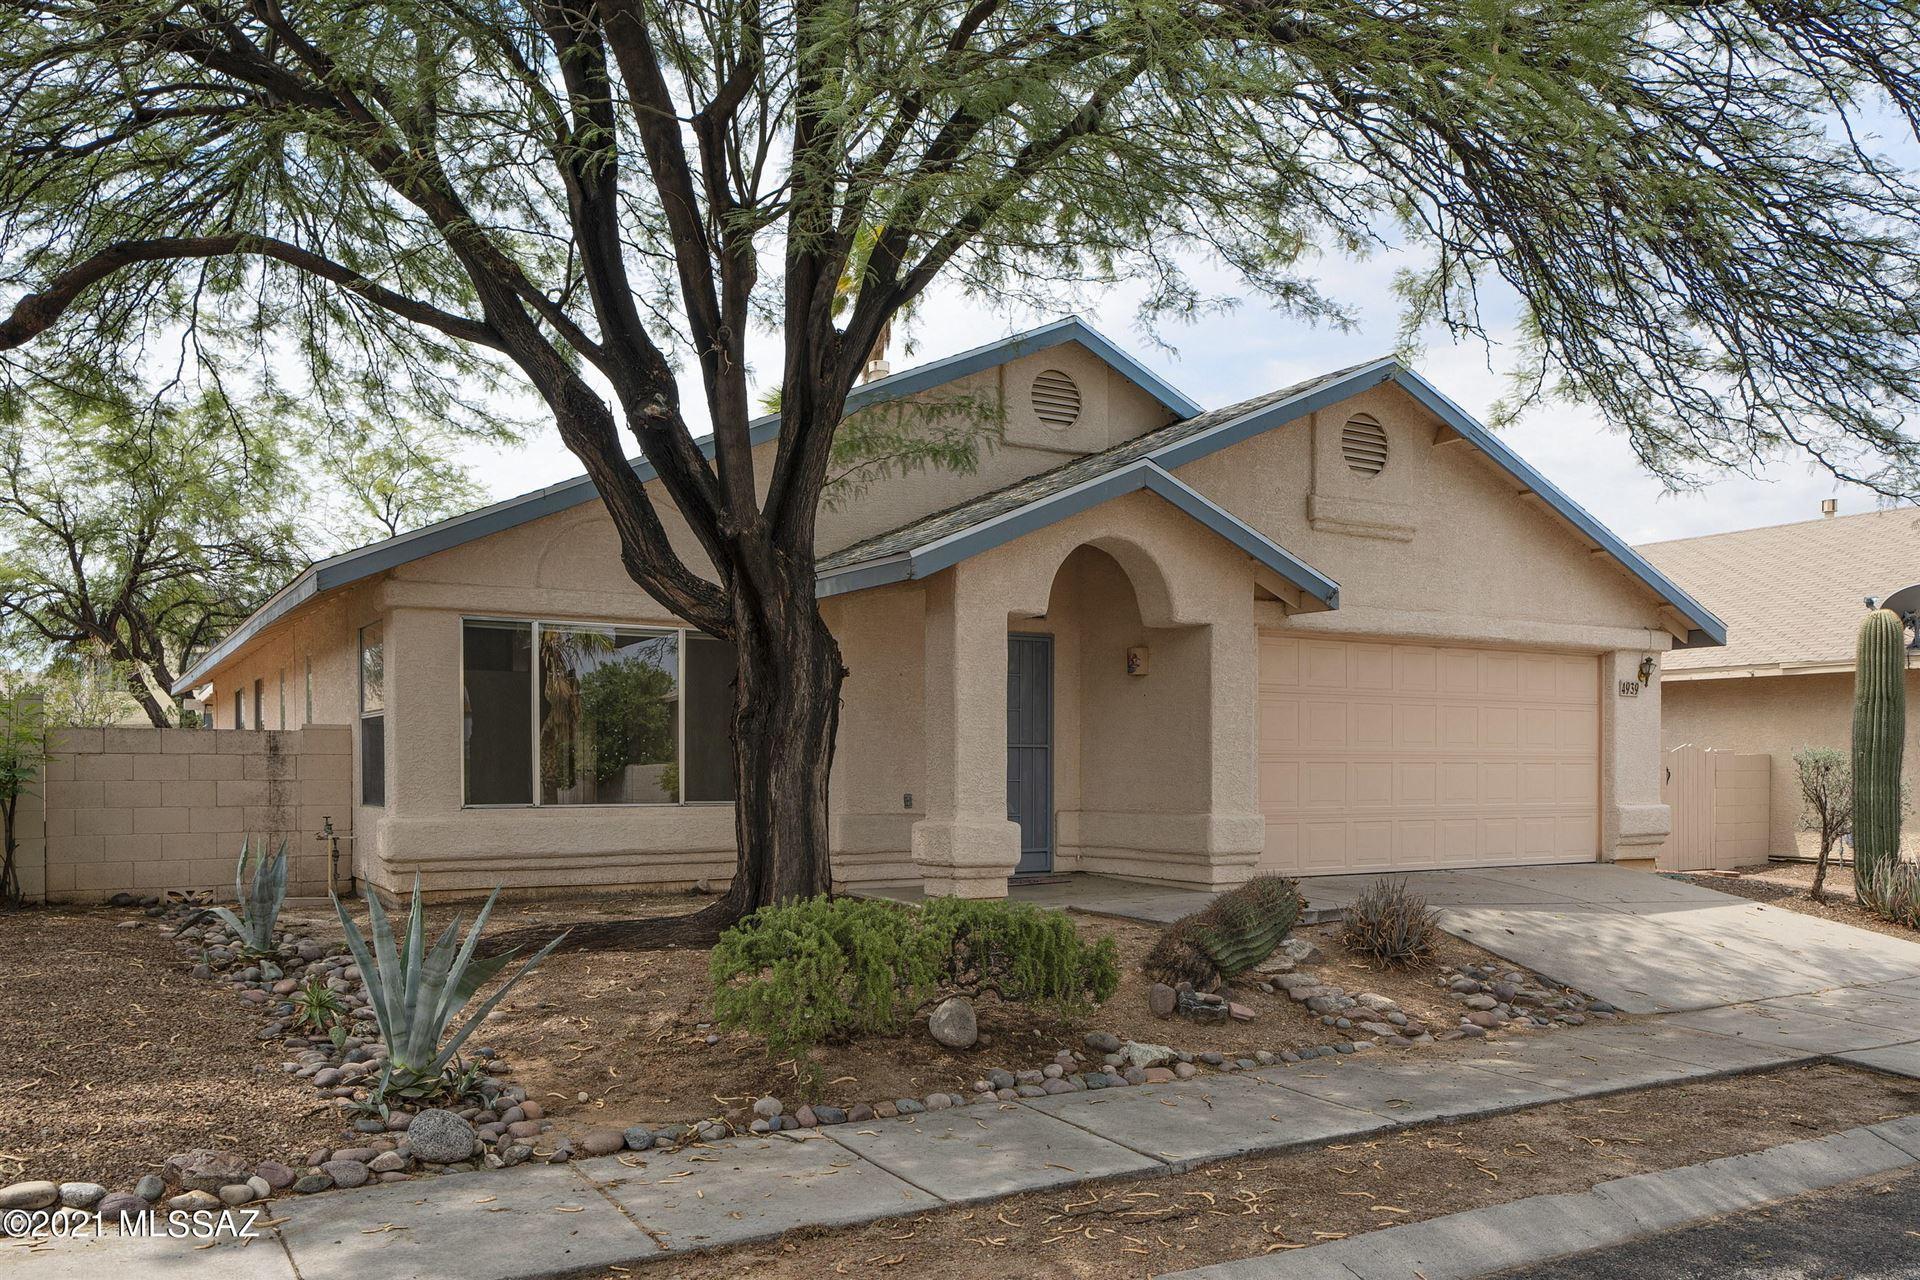 4939 W Didion Drive, Tucson, AZ 85742 - MLS#: 22123189